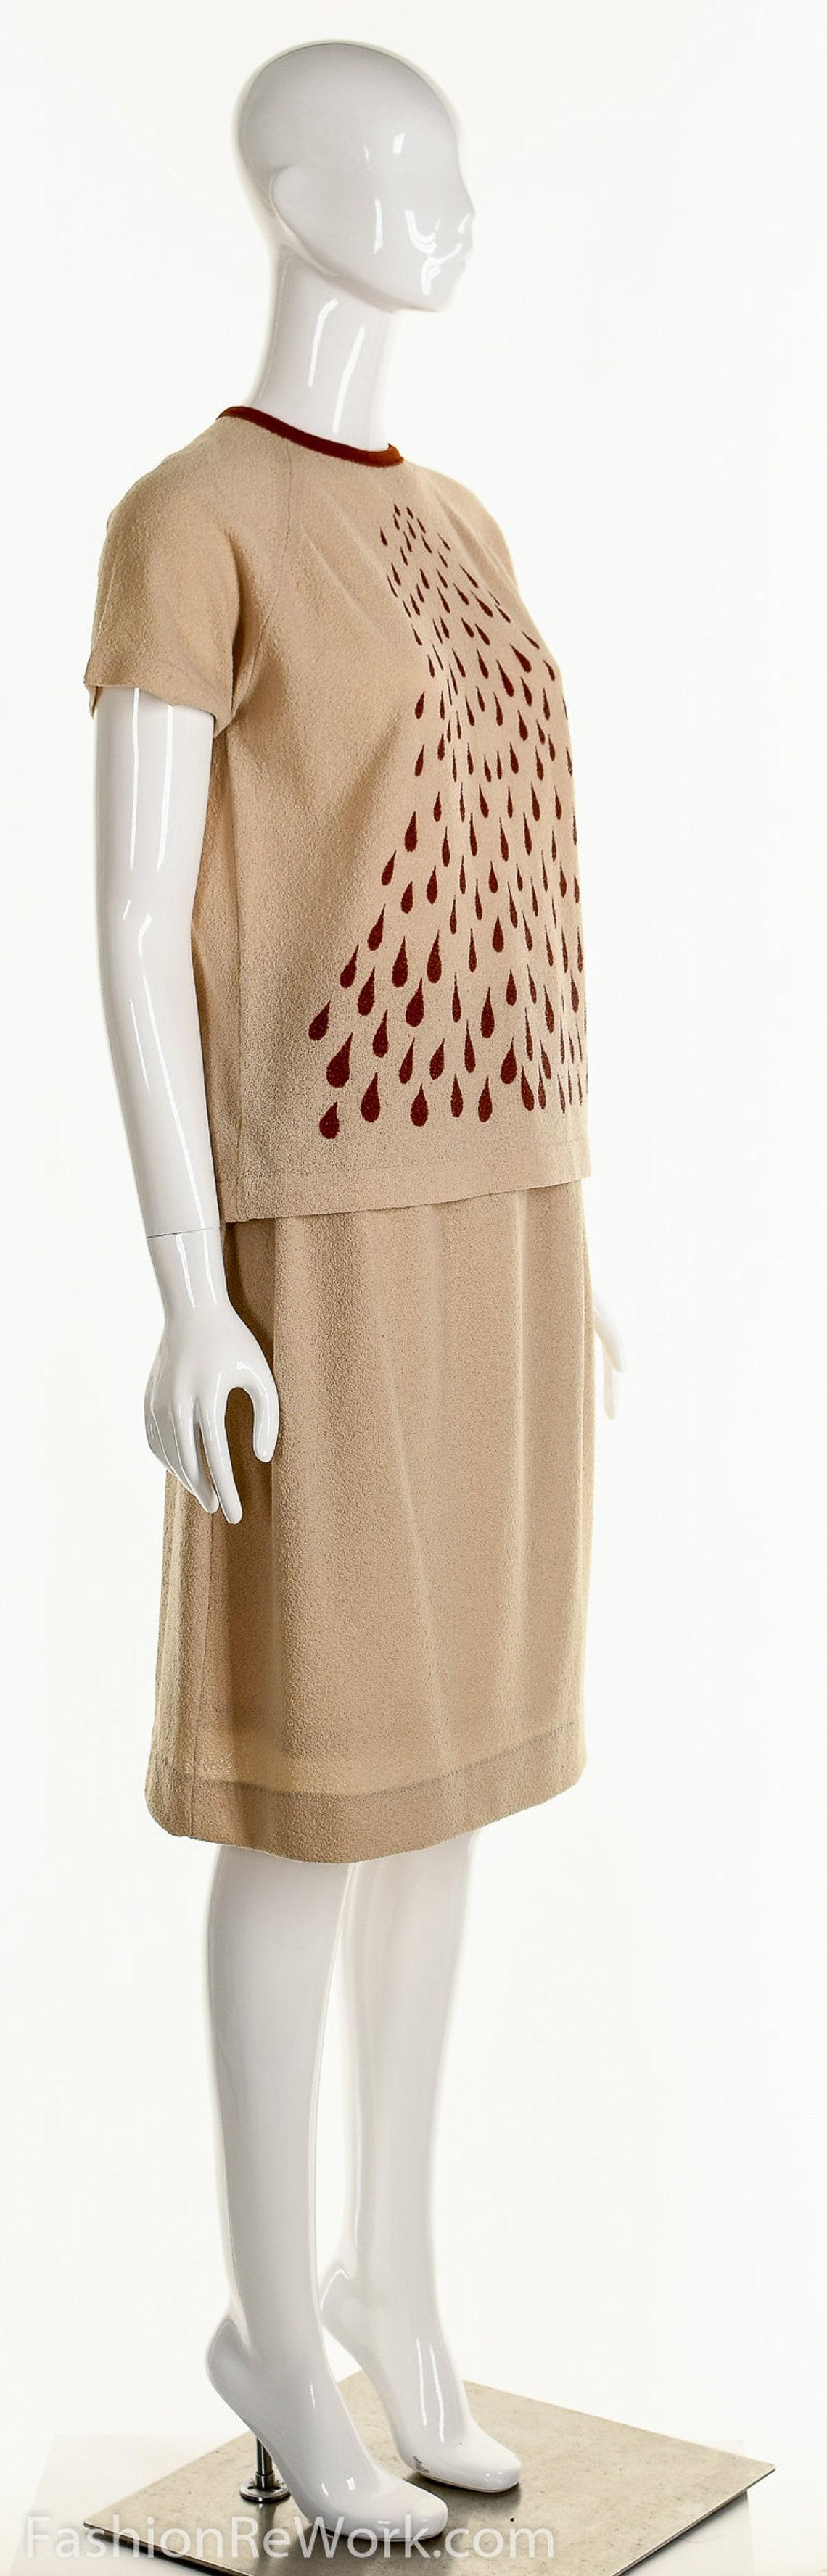 Rain Drop Dress 70's 2 Piece Dress 2 Piece Dress Suit